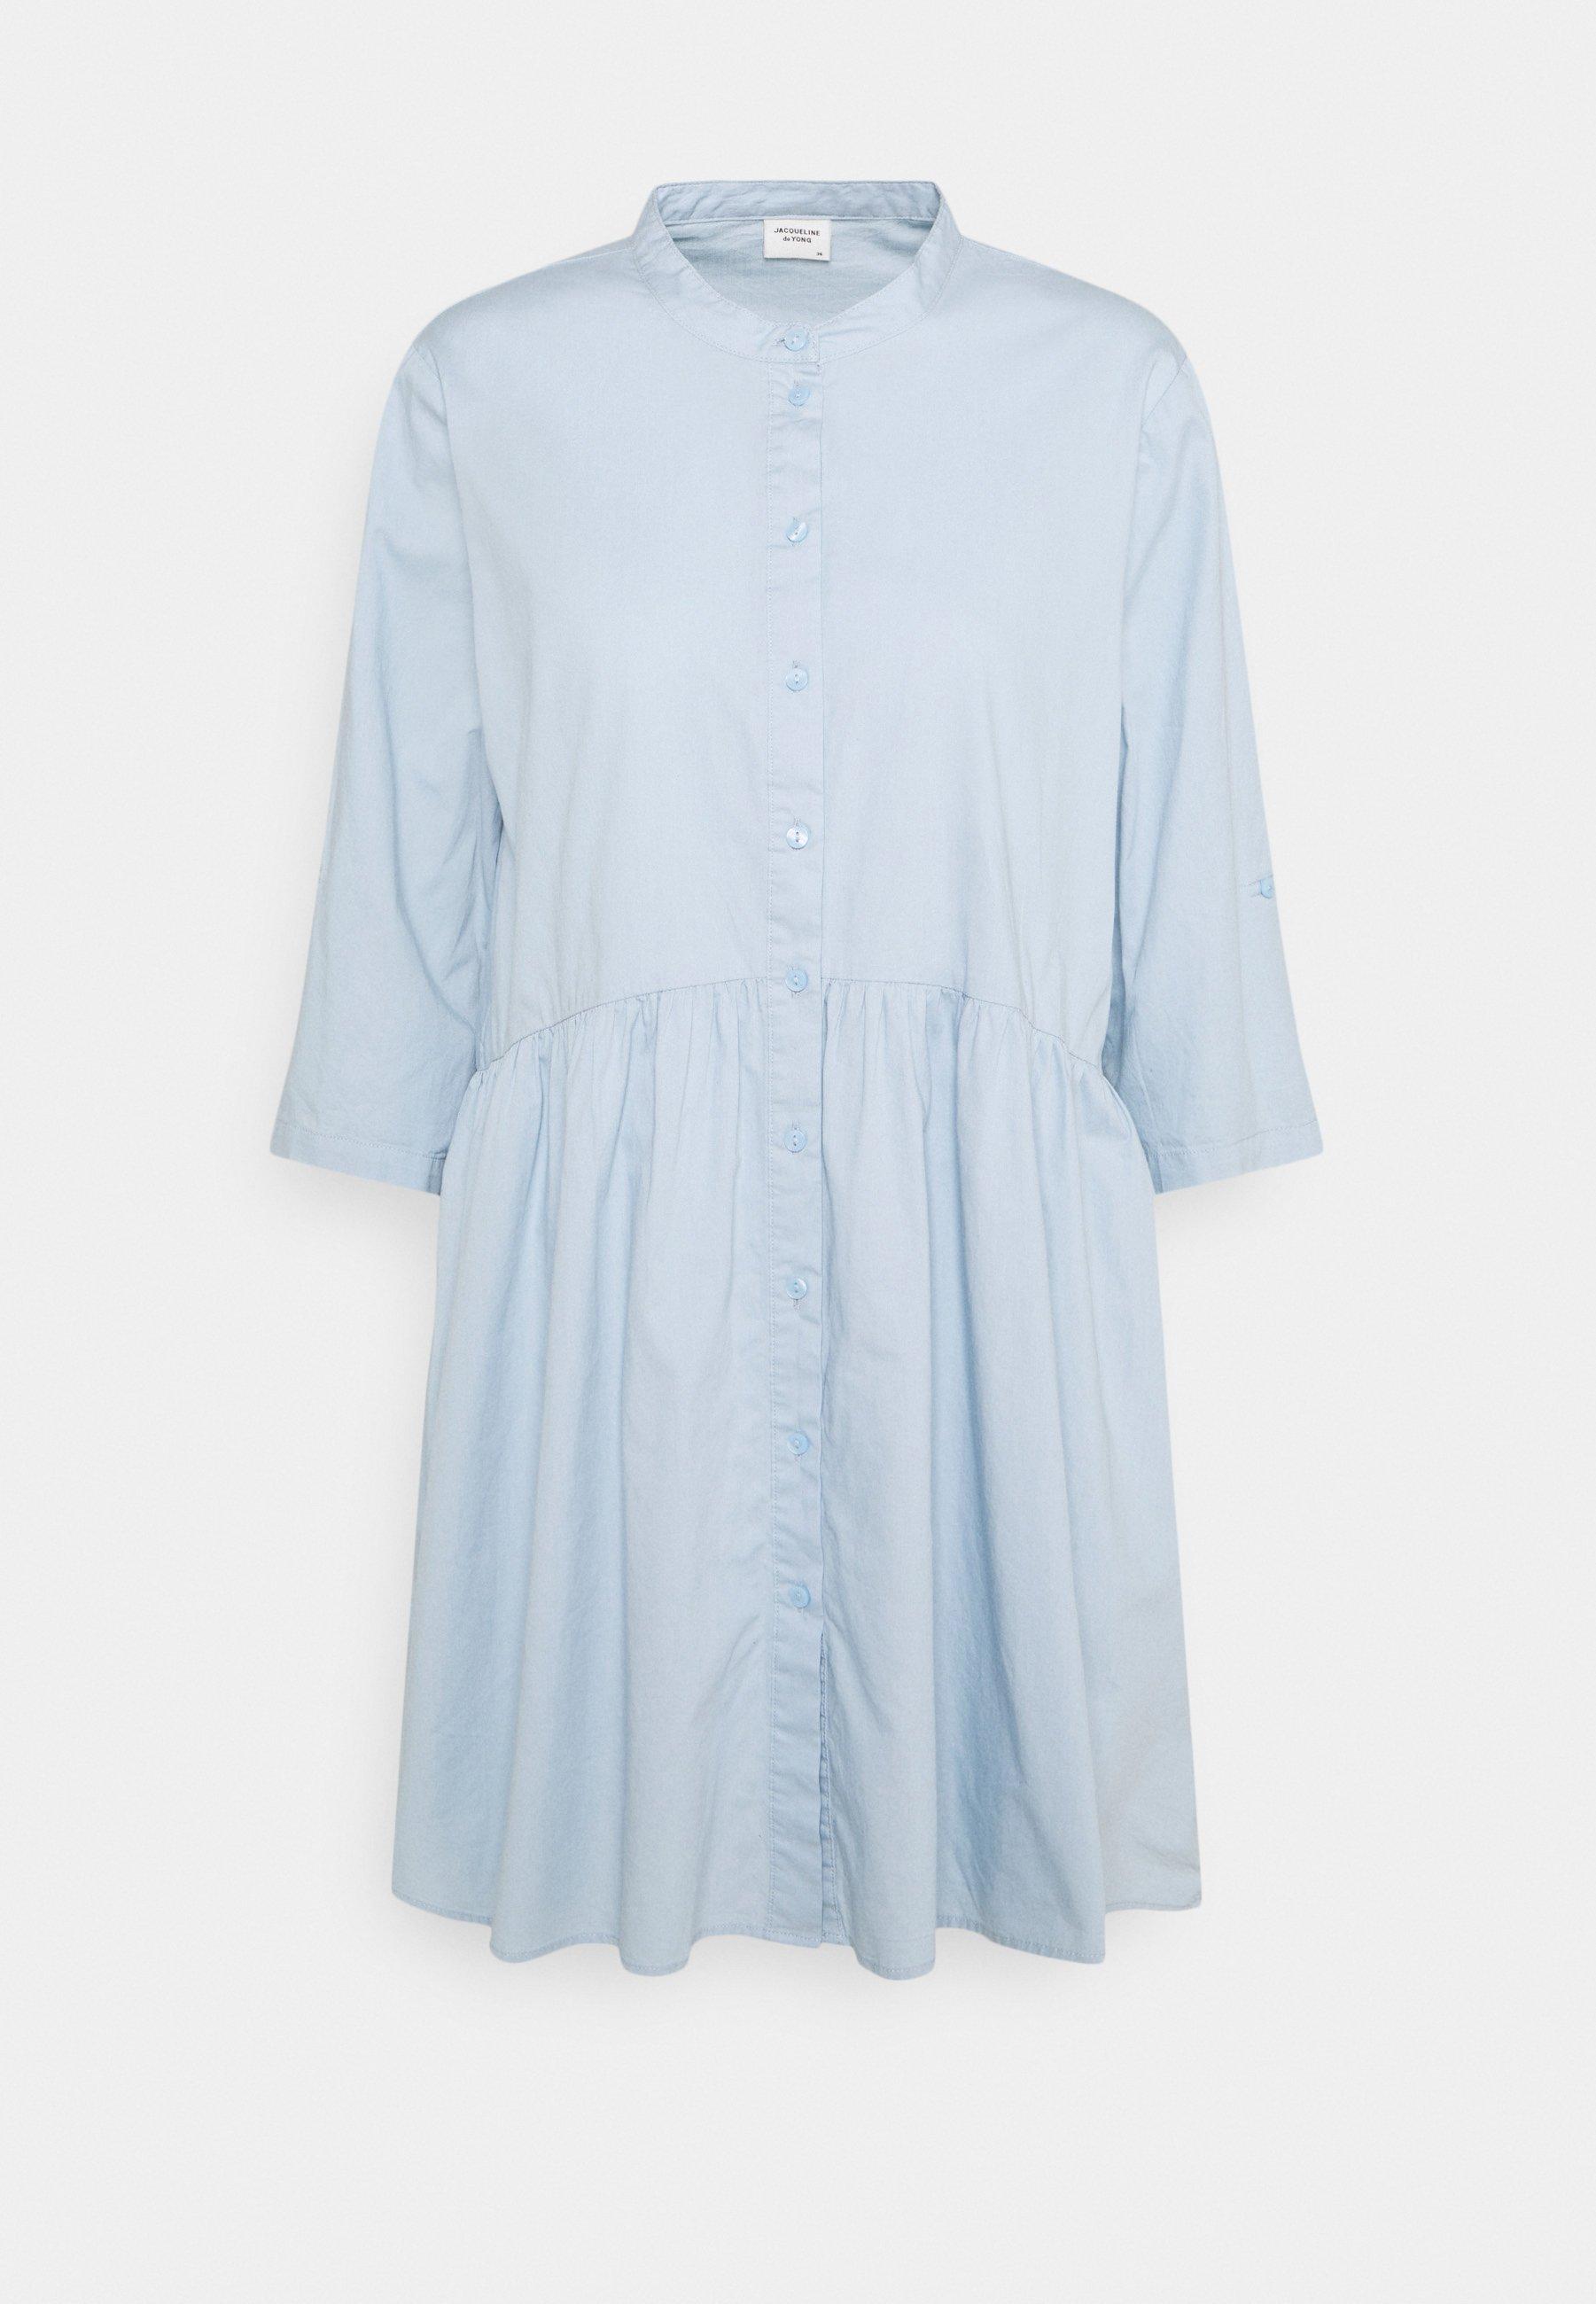 Donna CAMERON LIFE SHORT DRESS - Abito a camicia